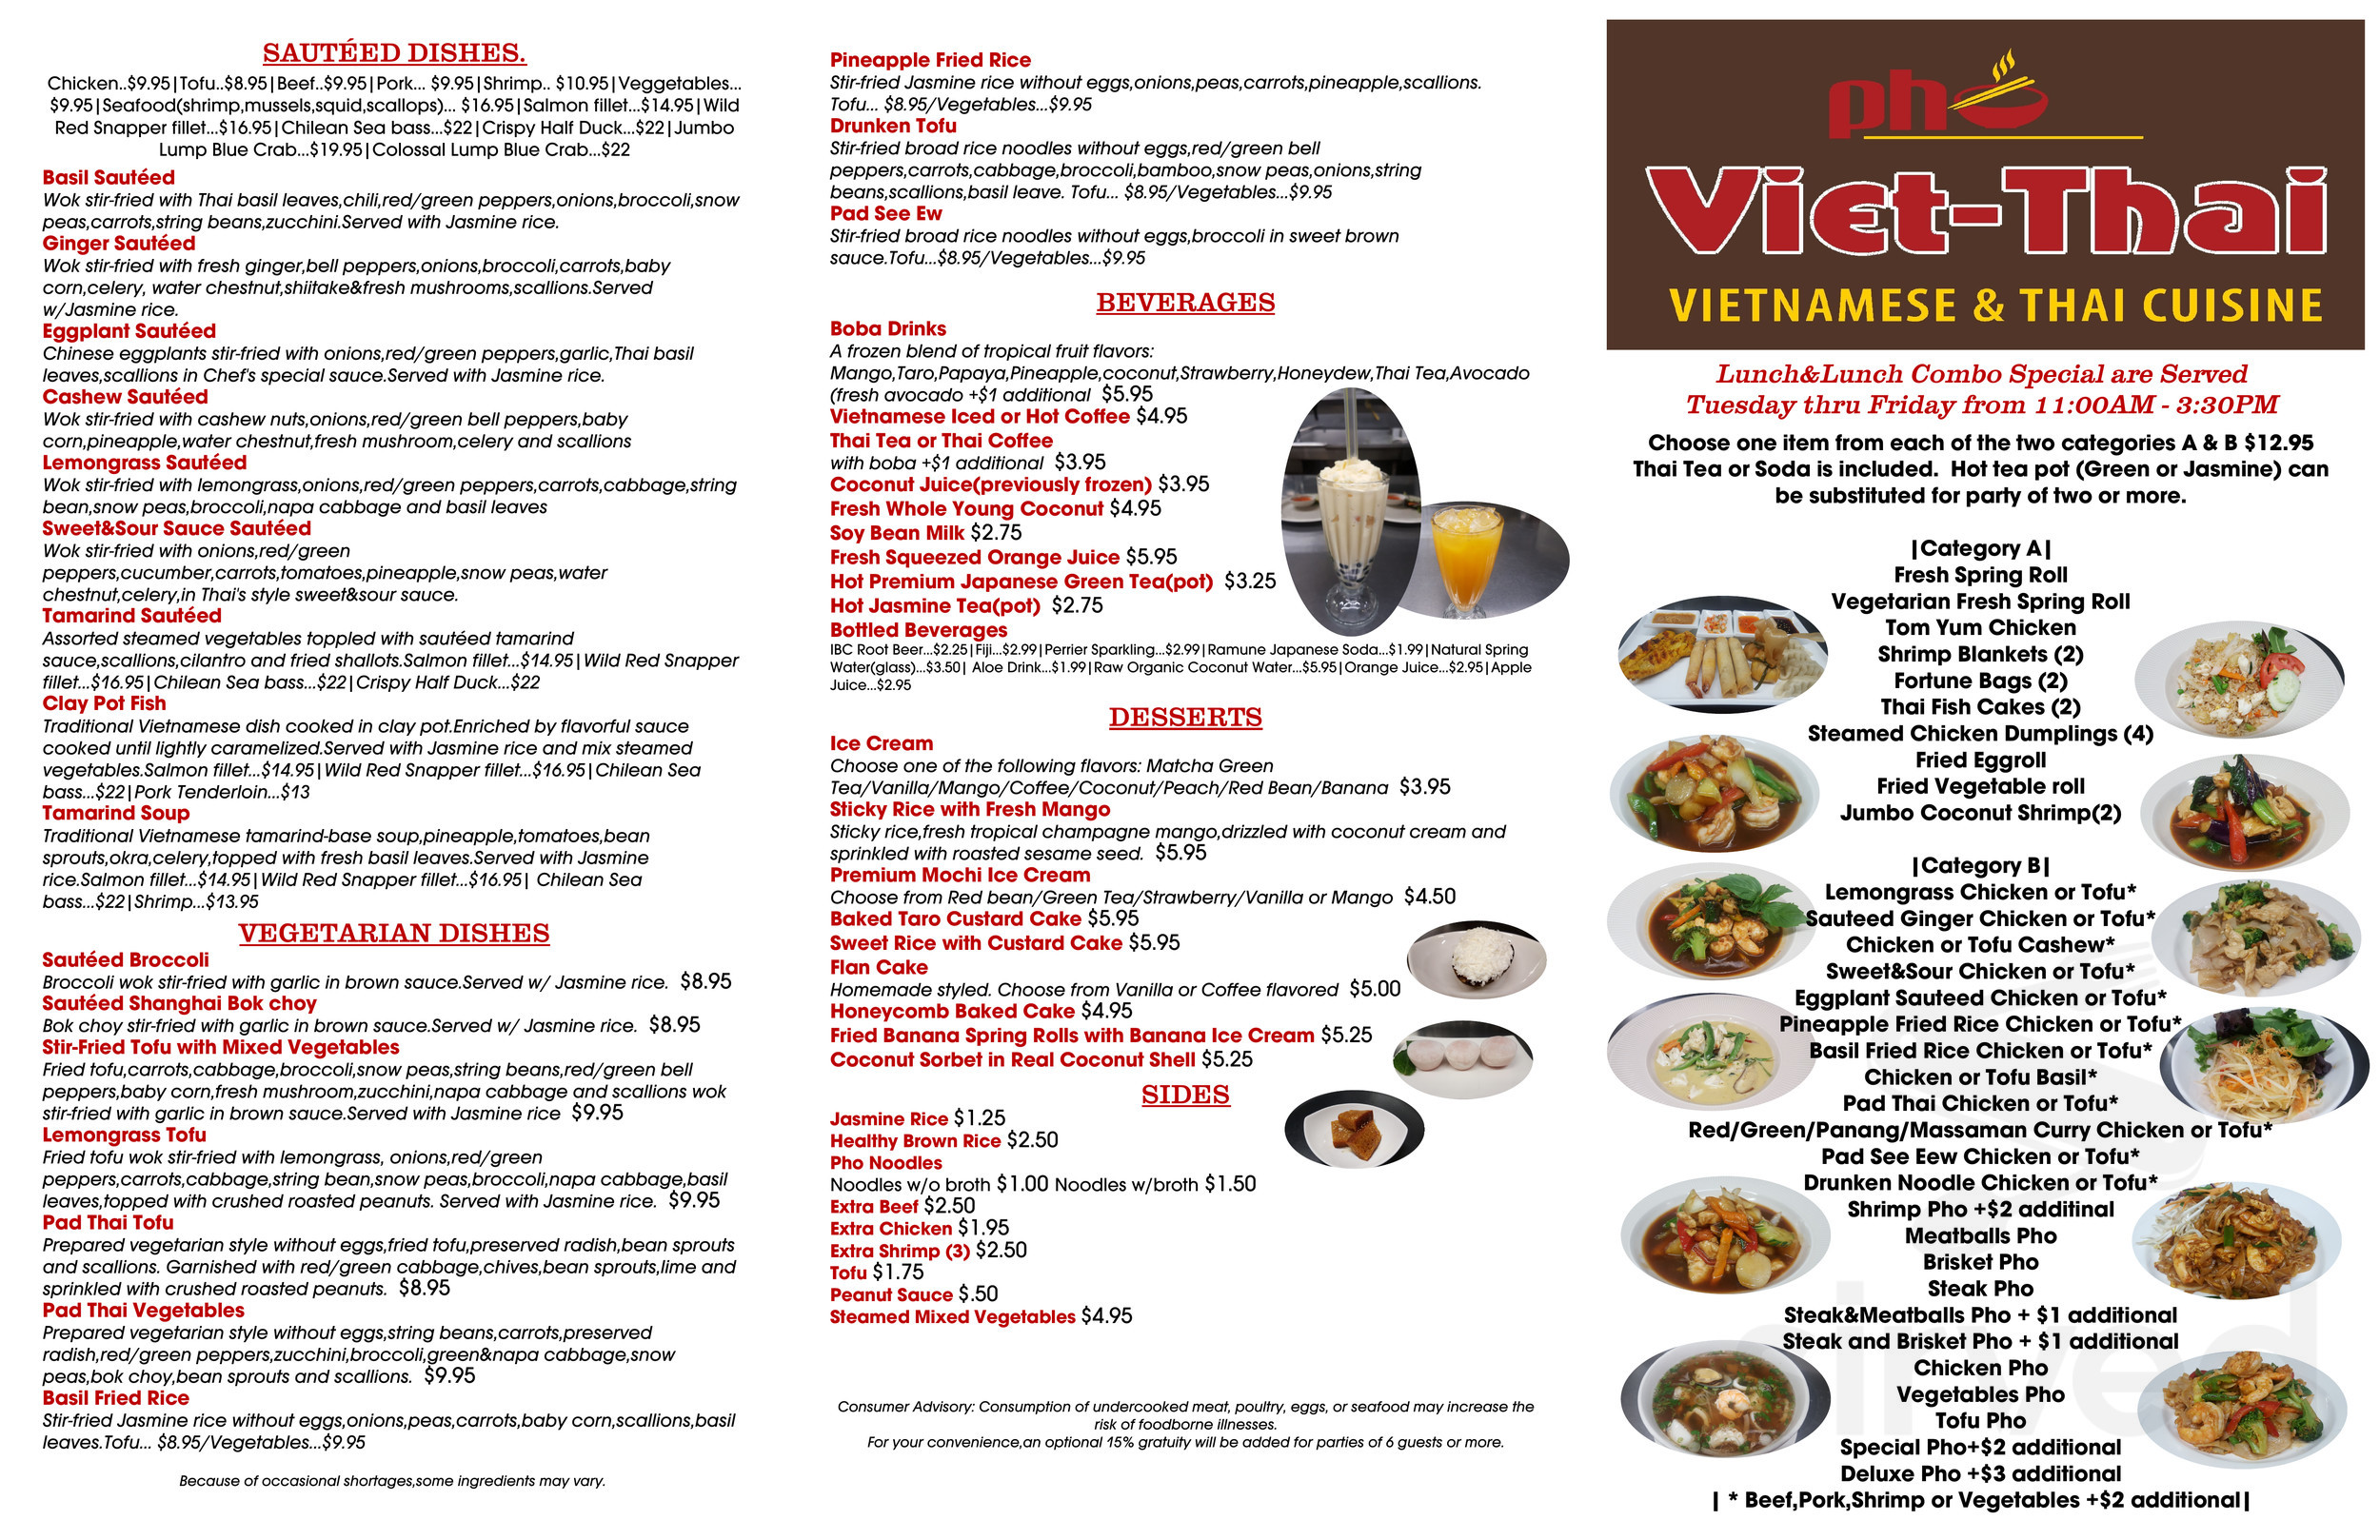 Viet Thai Cuisine Menu In Horsham Pennsylvania Usa